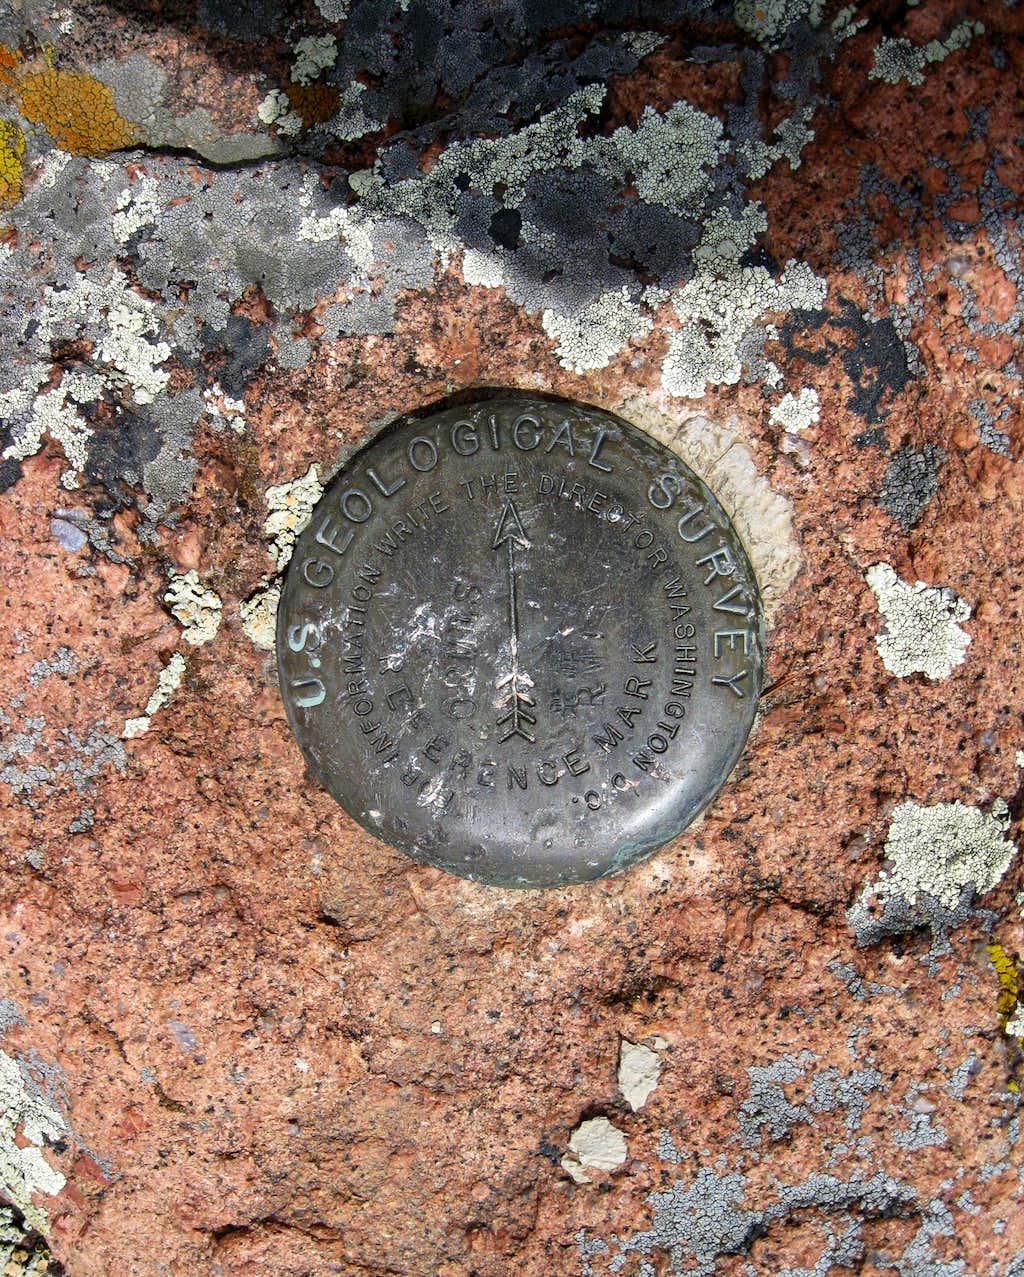 Elevation Marker Plan : Elevation marker photos diagrams topos summitpost